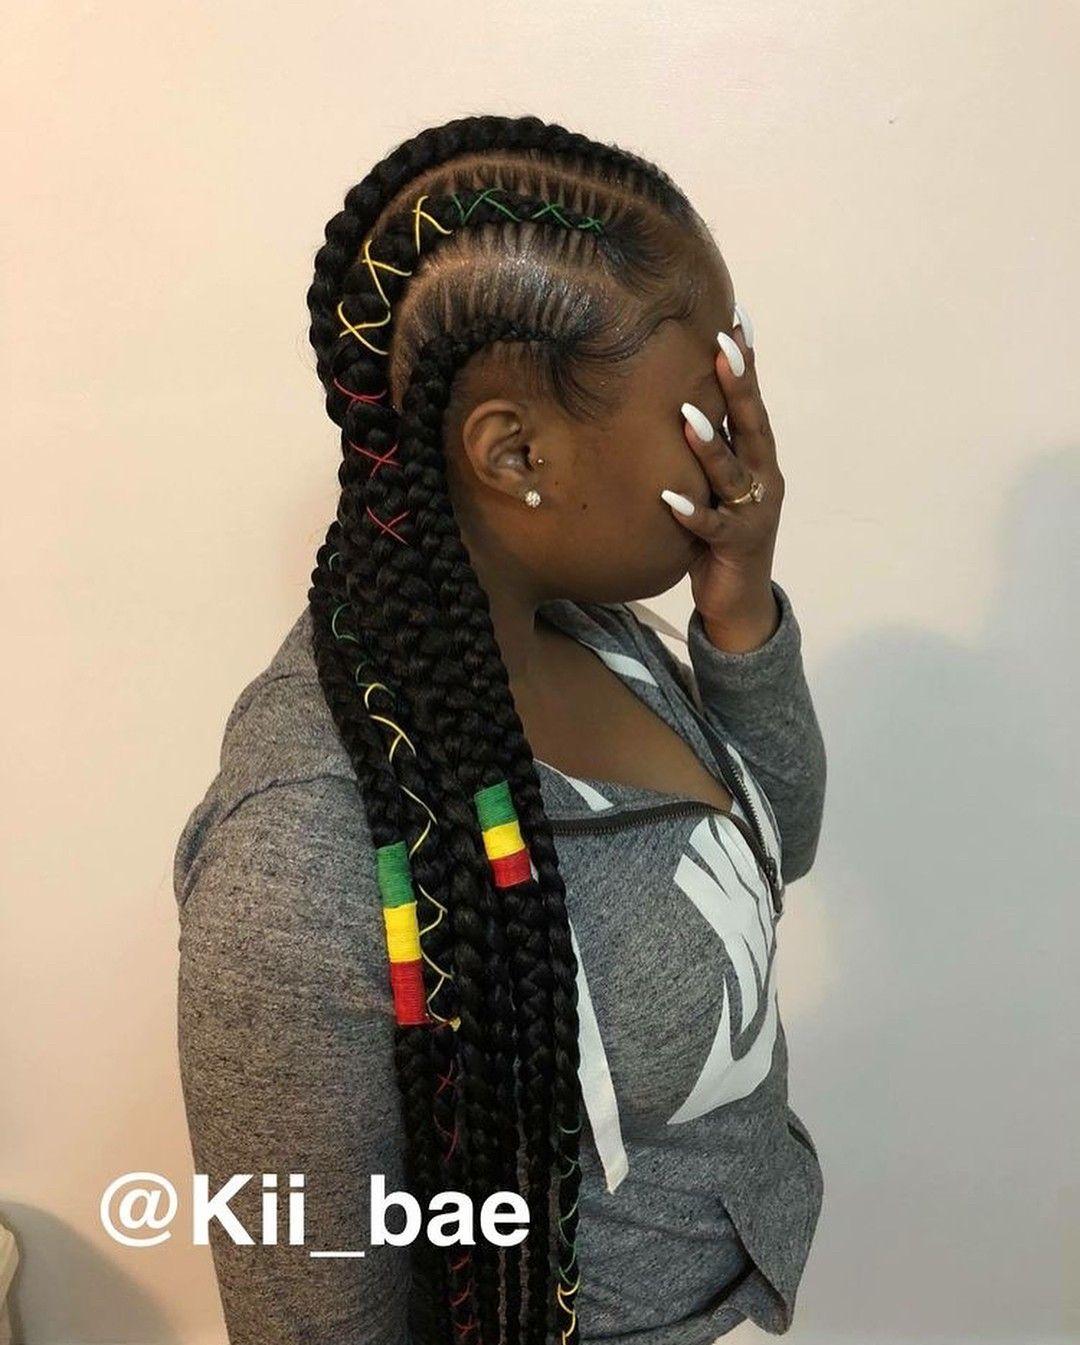 Pin by kiara jackson on hair pinterest girly girls girly and